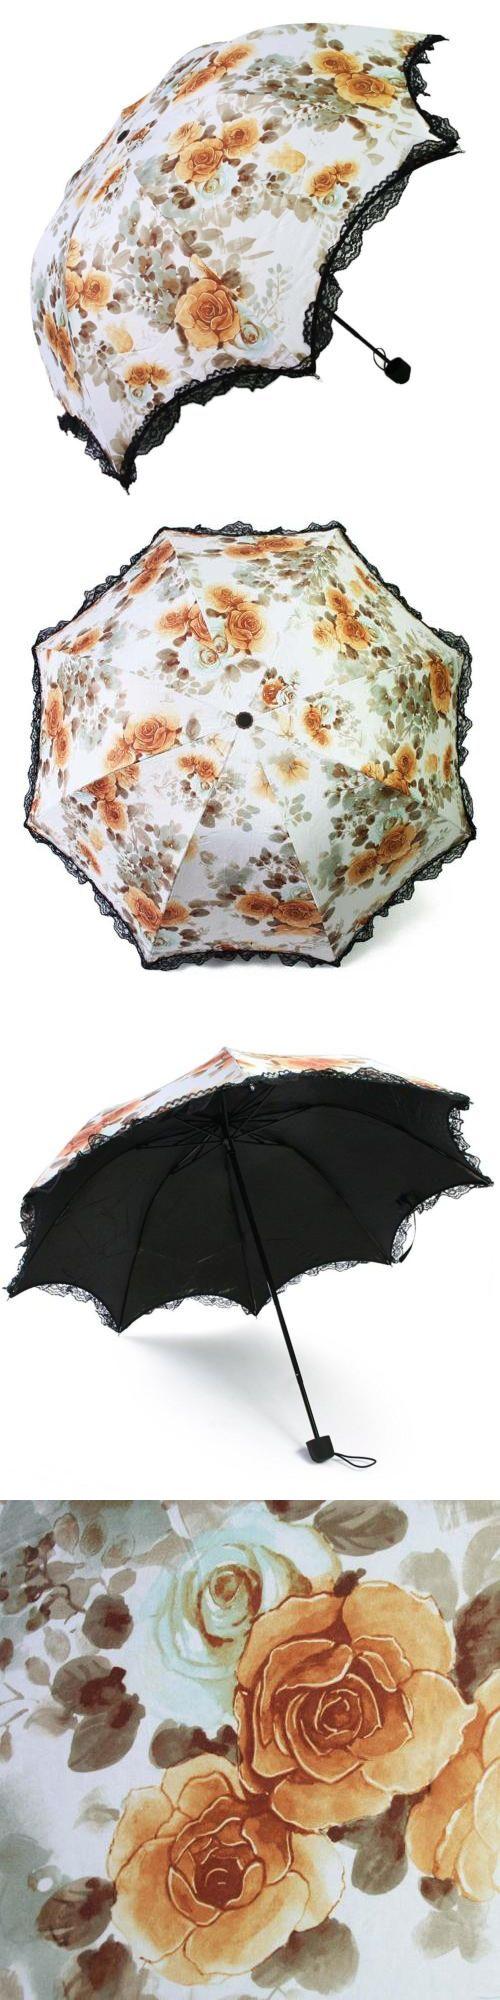 Umbrellas 105569: Kilofly Anti-Uv Folding Travel Parasol Vintage Floral Rain Sun Shade Umbrella -> BUY IT NOW ONLY: $37.04 on eBay!